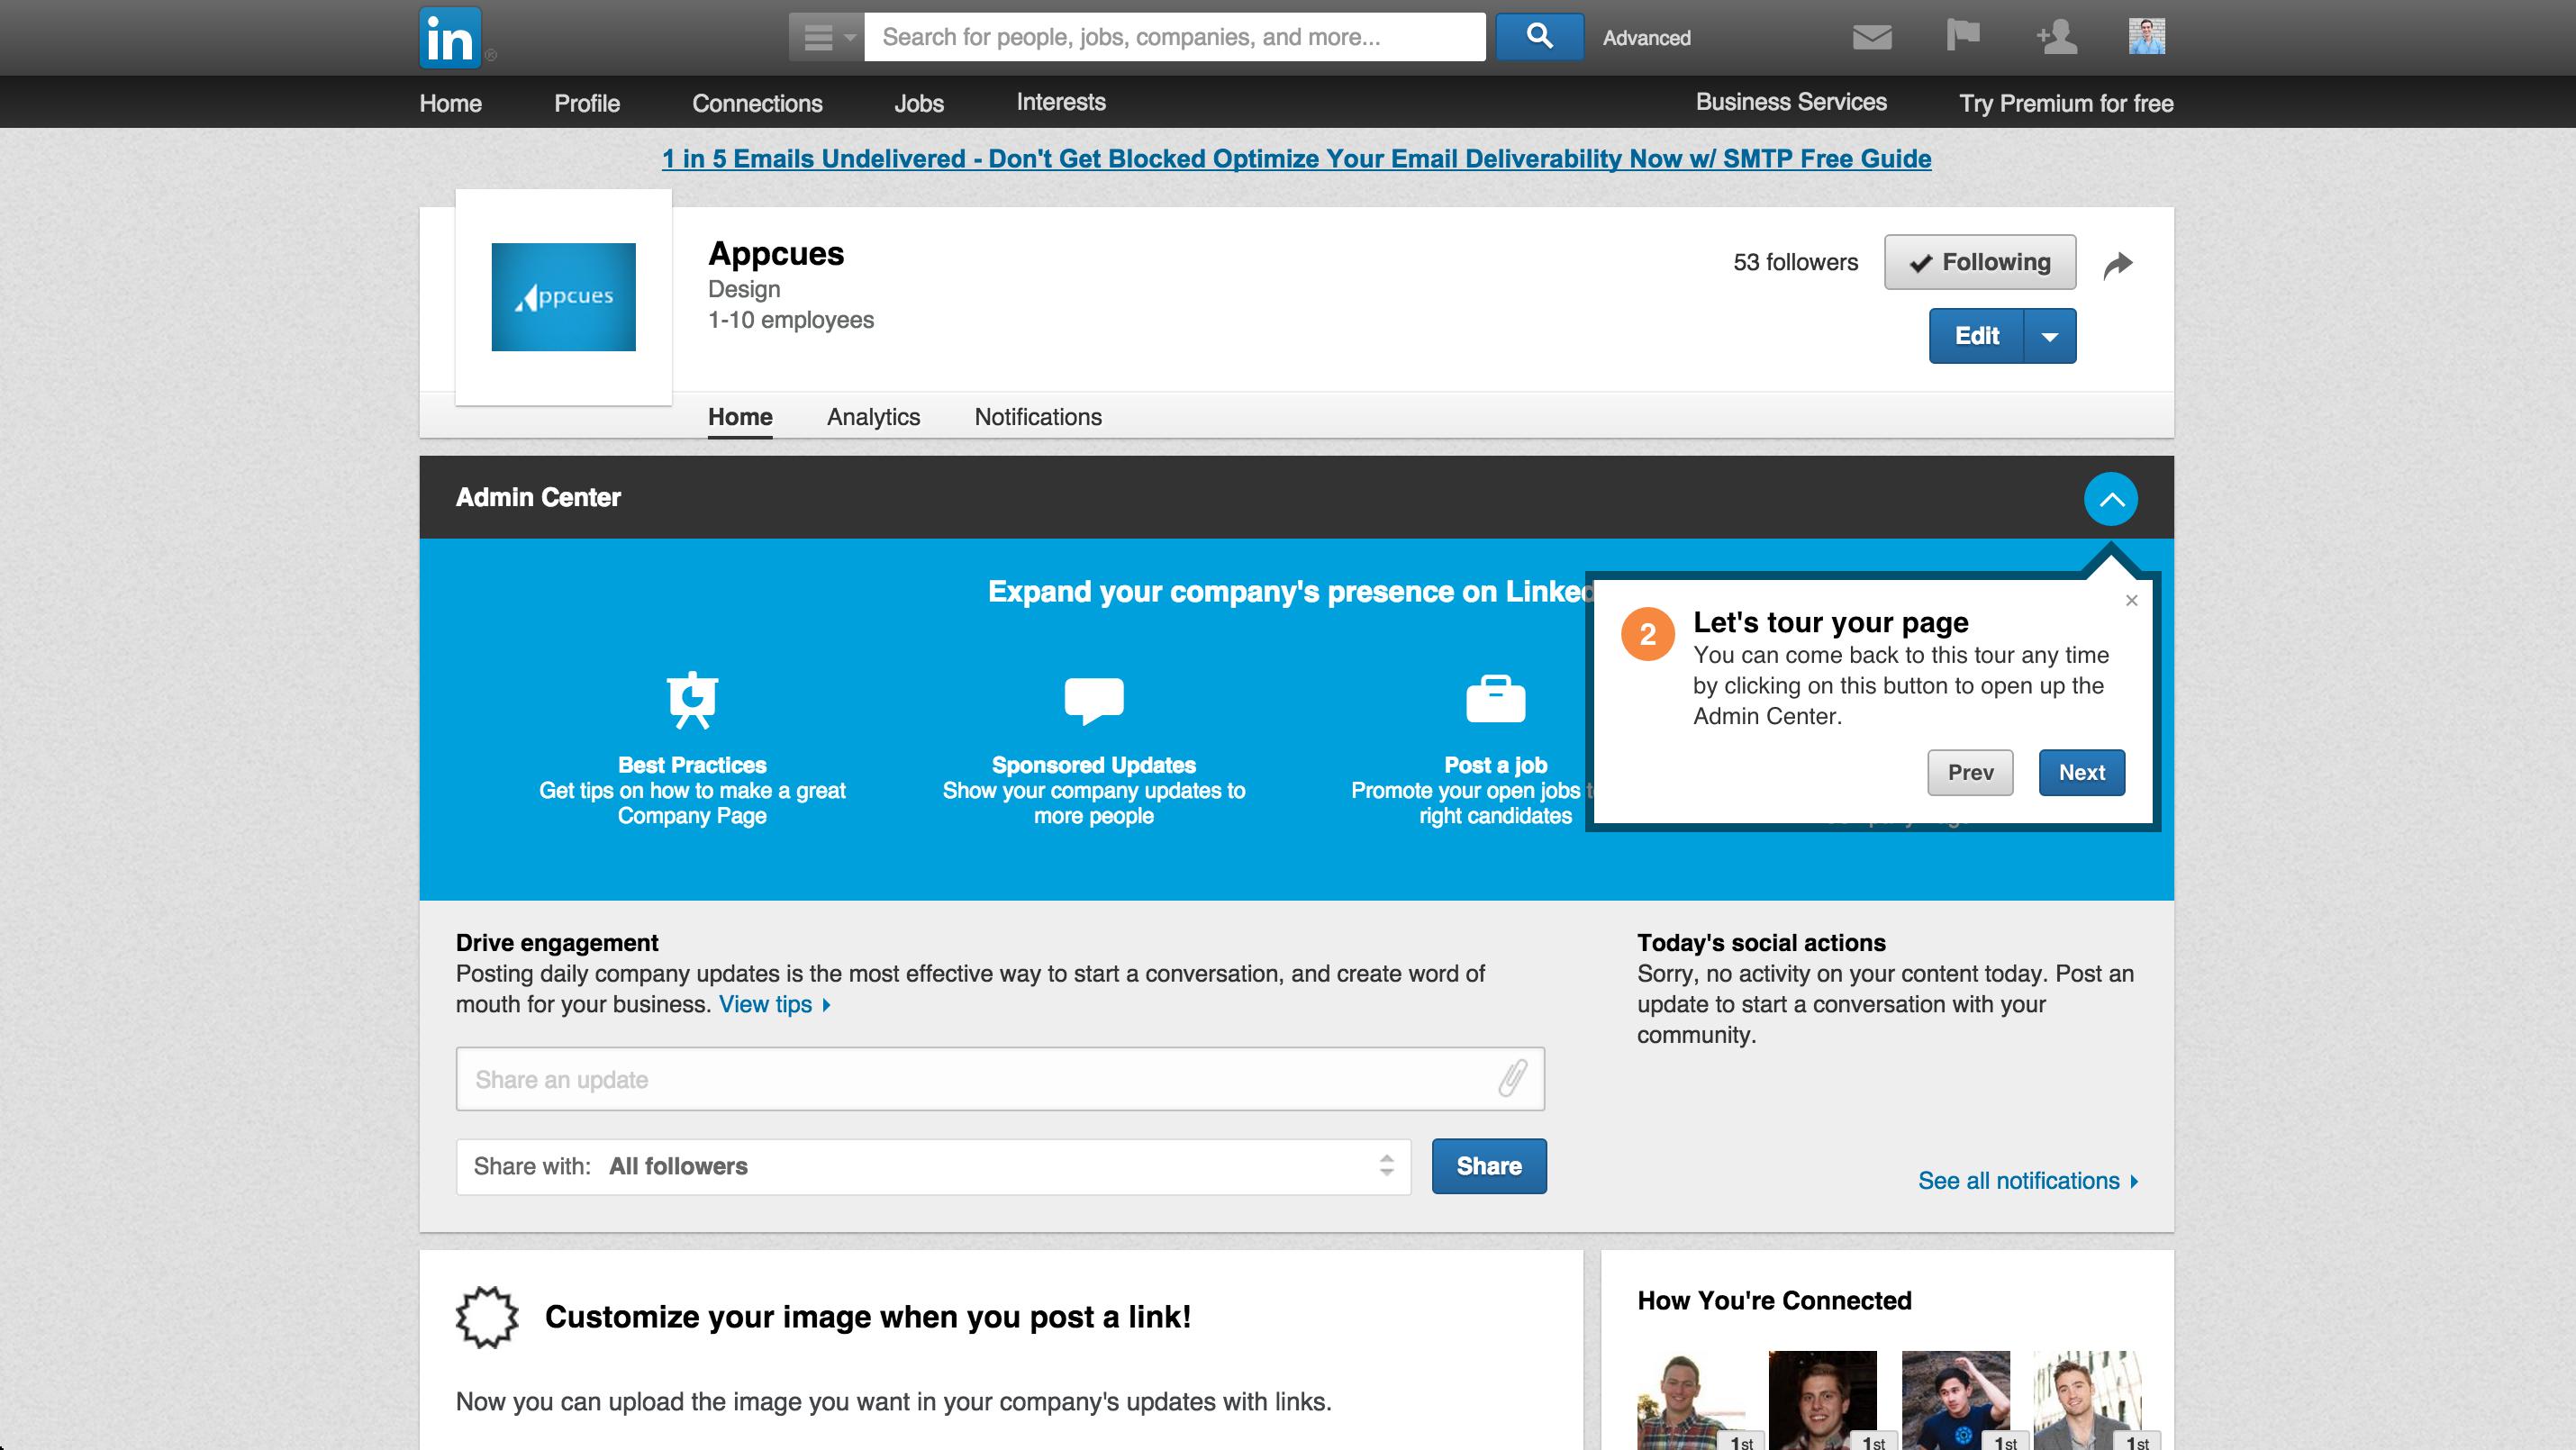 LinkedIn product tour company page 2